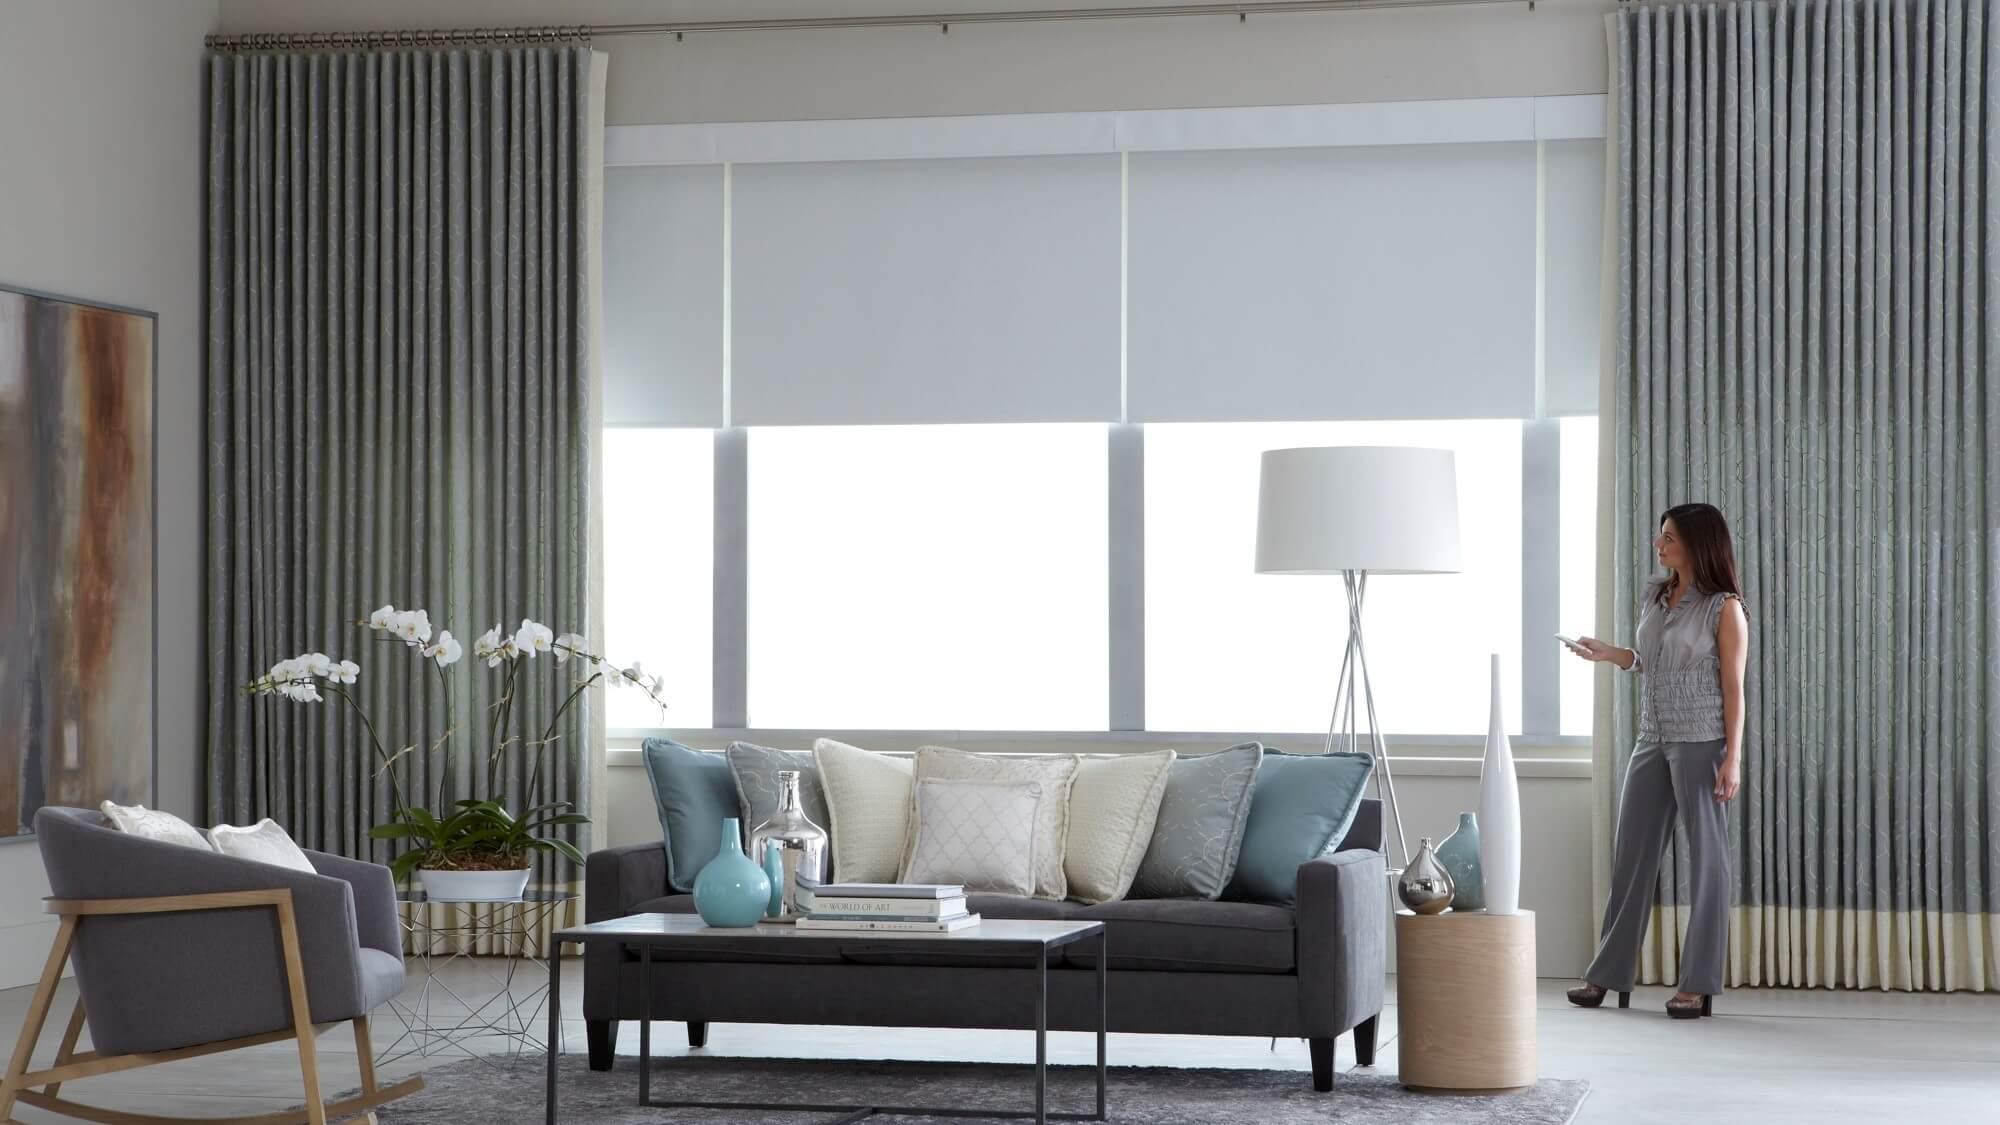 Popular Interior Design Trends For 2020